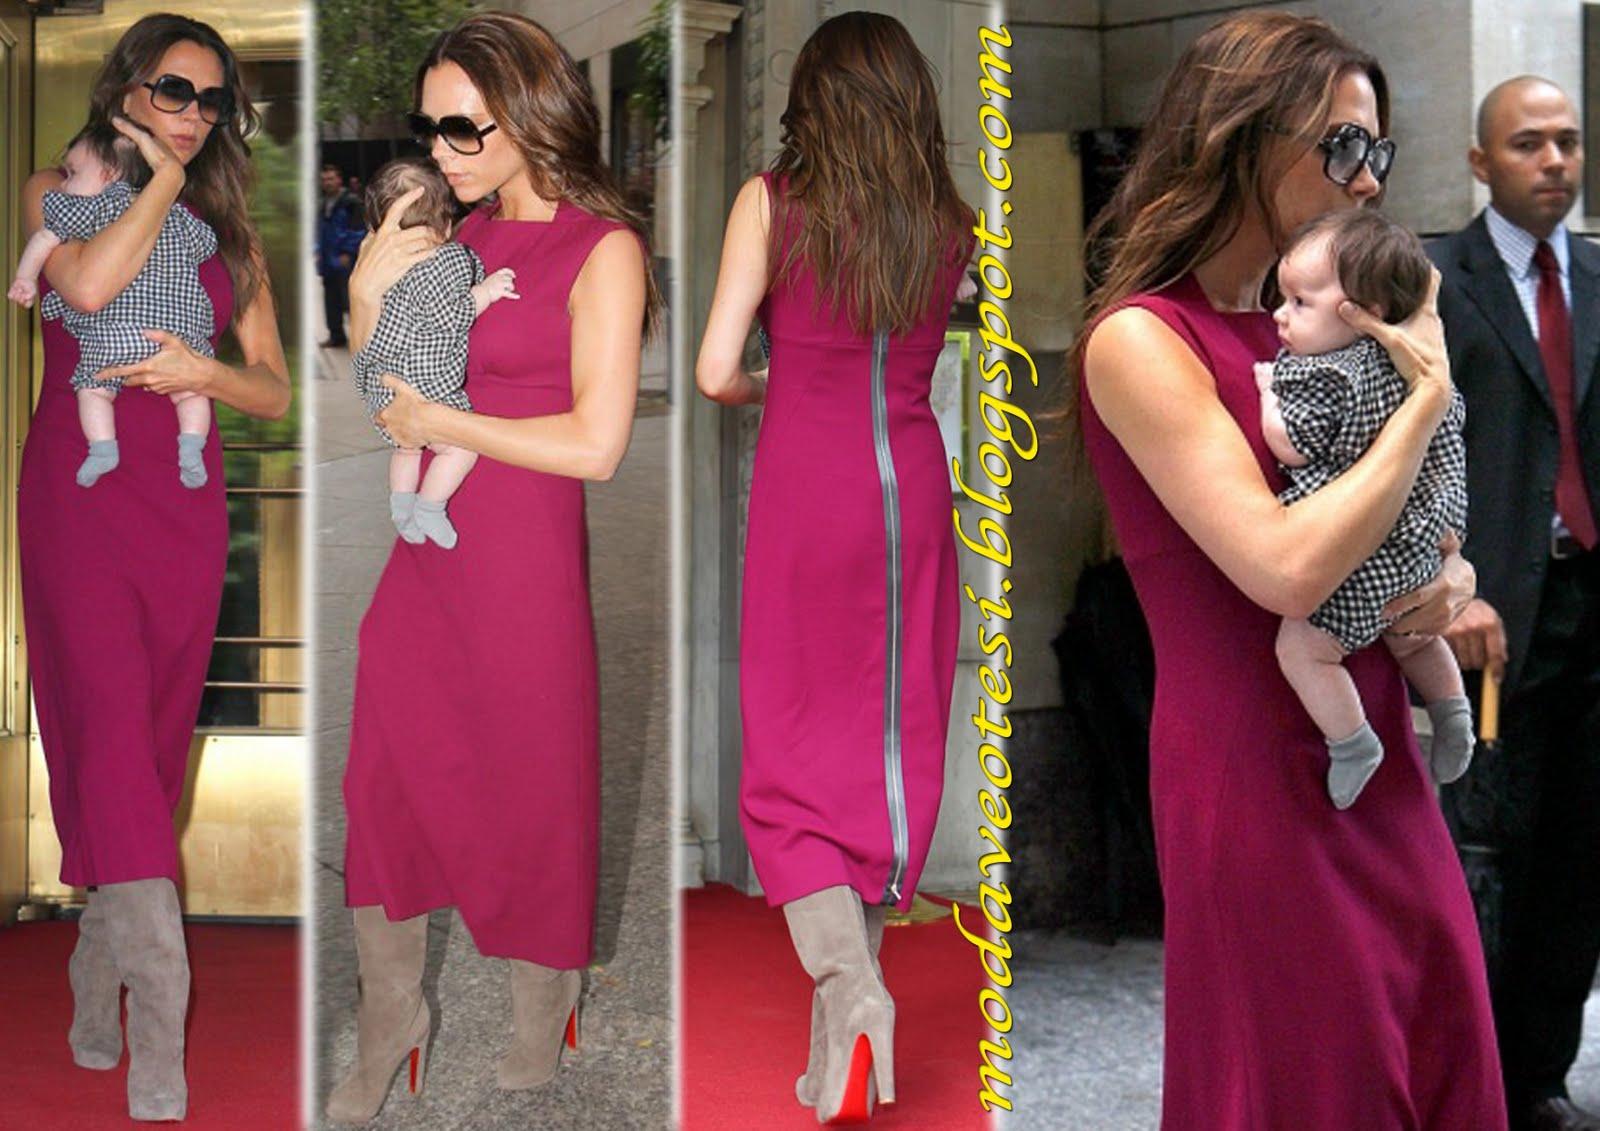 672992f88ae93 Victoria Beckham kendi tasarimi pembe elbisesi ve tas rengi Christian  Louboutin